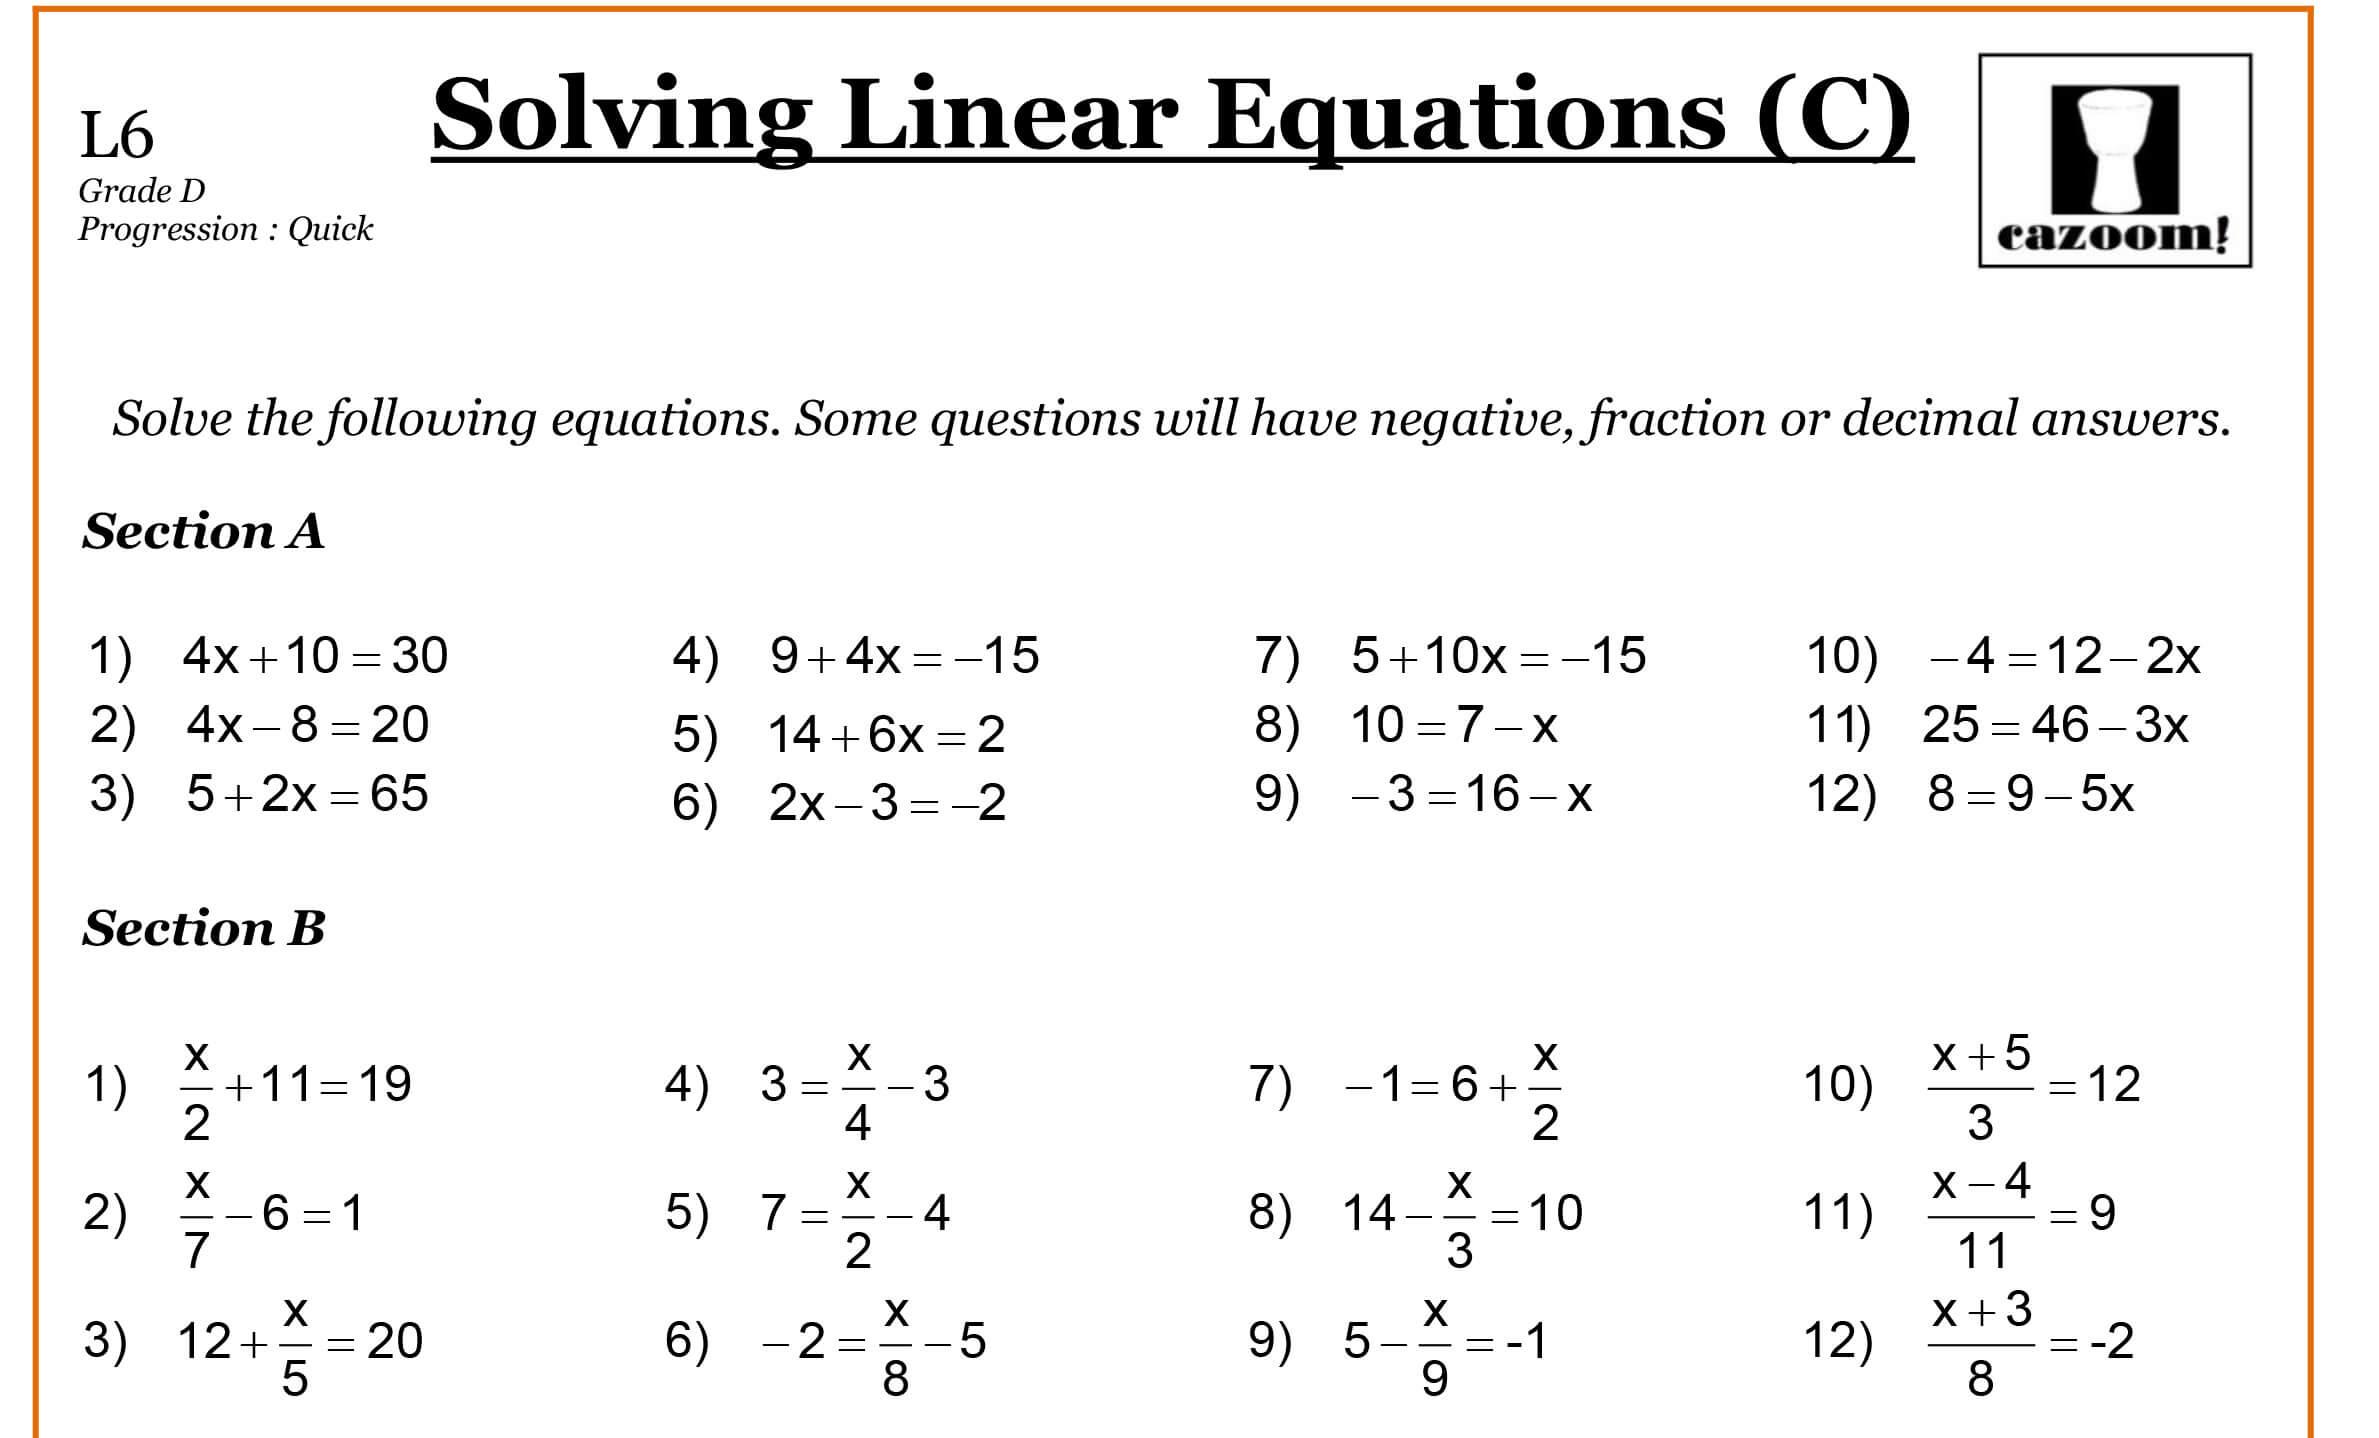 Year 9 Maths Worksheets | Printable Maths Worksheets | Grade 9 Math Worksheets Printable Free With Answers